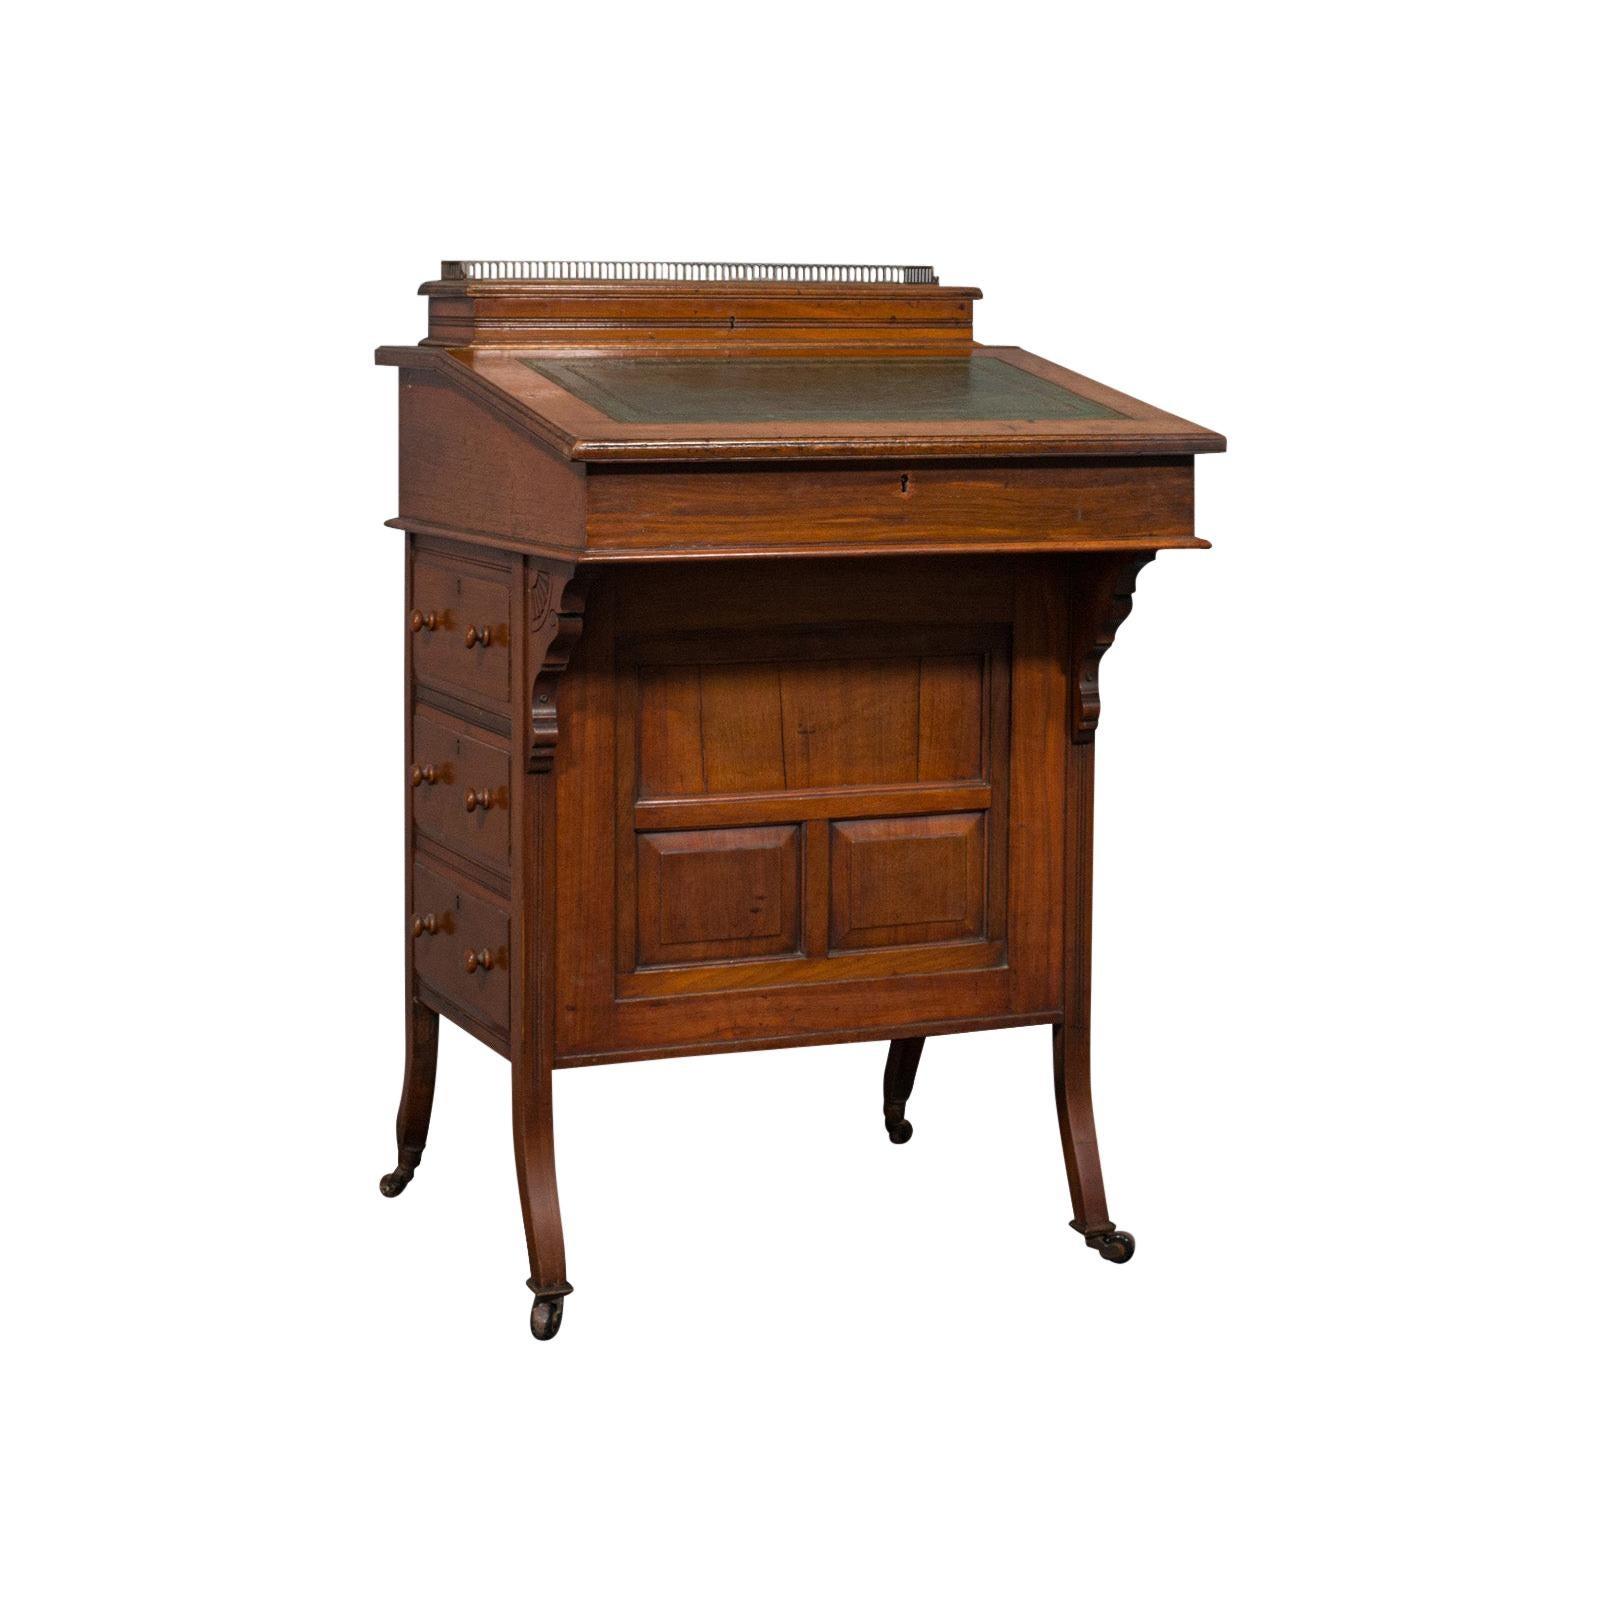 Antique Davenport, English Walnut, Bird's-Eye Maple Writing Desk, Victorian